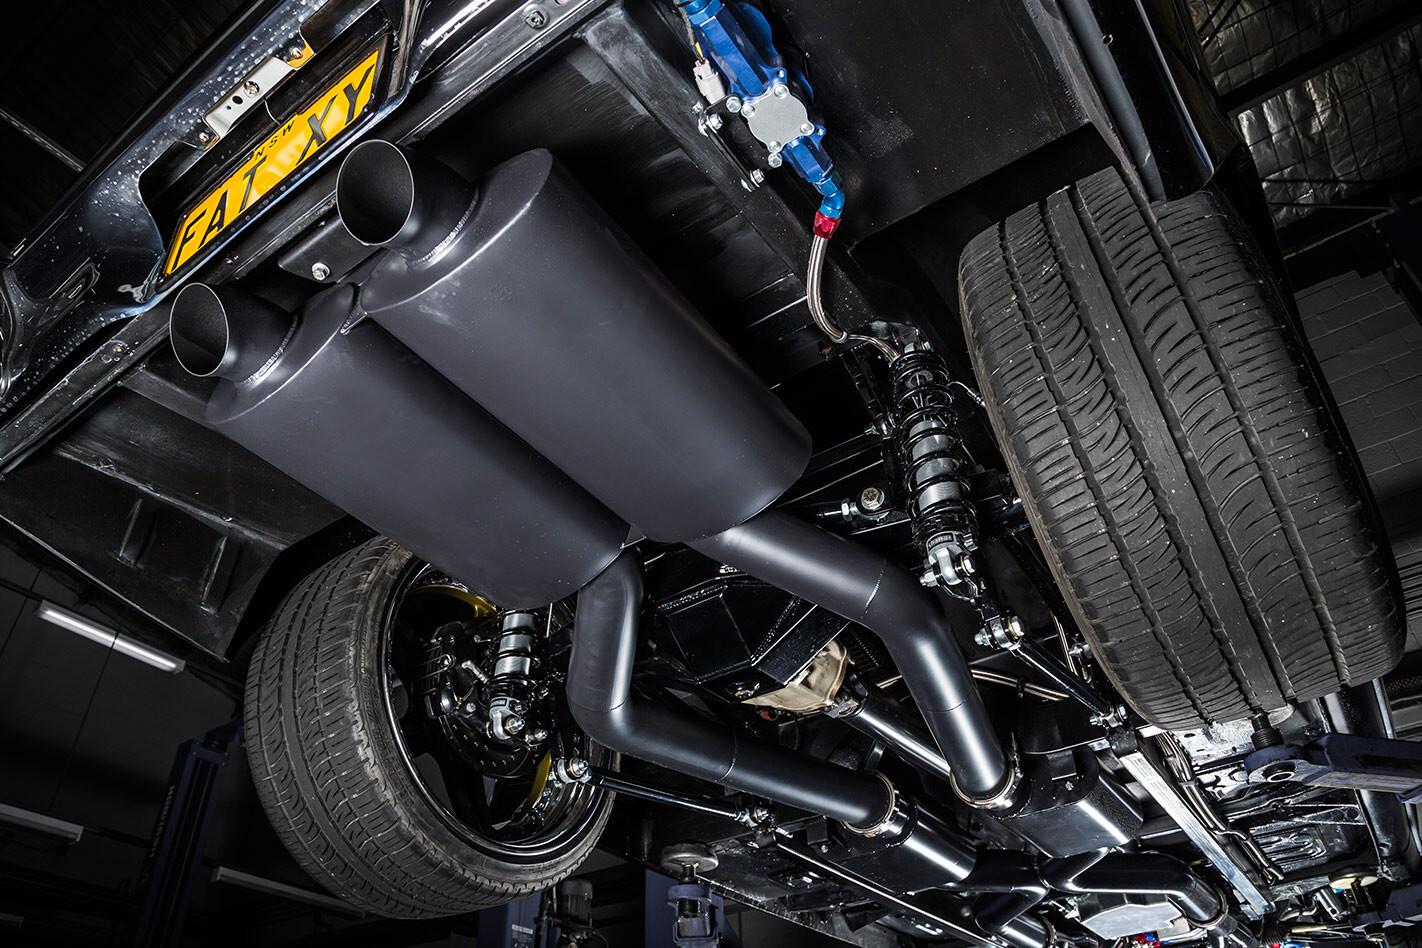 Ford Falcon XY mufflers